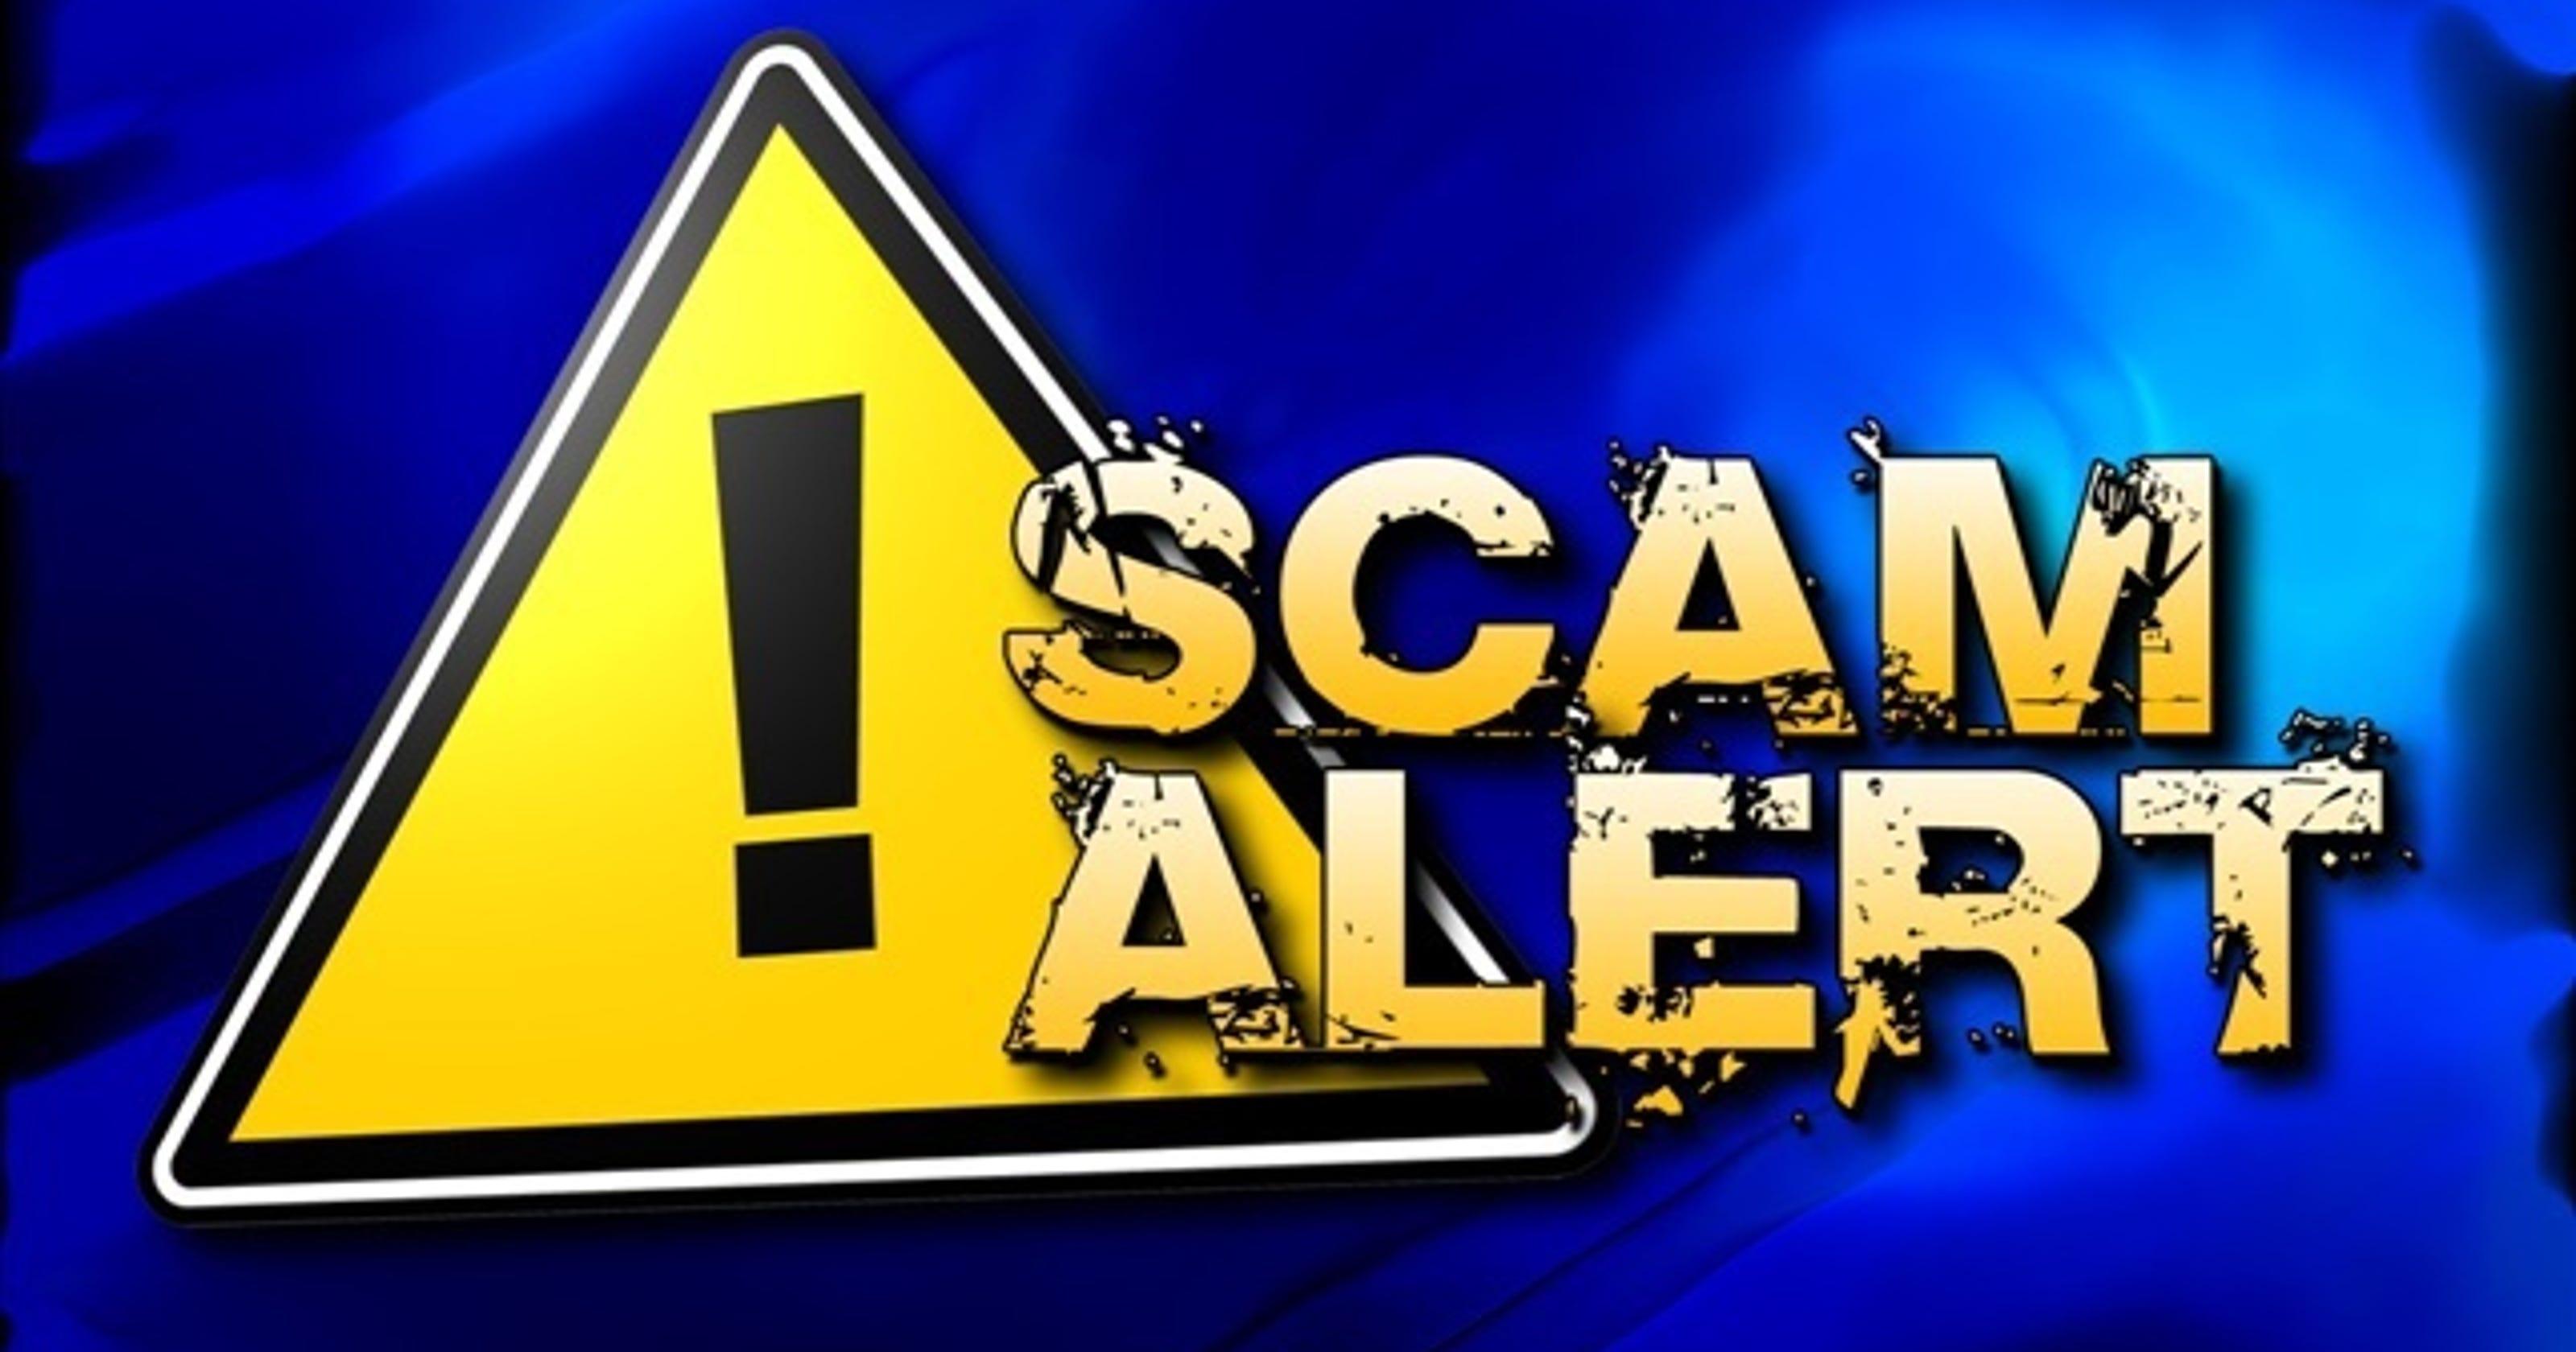 Fraud alert issued for immigrants seeking legal help